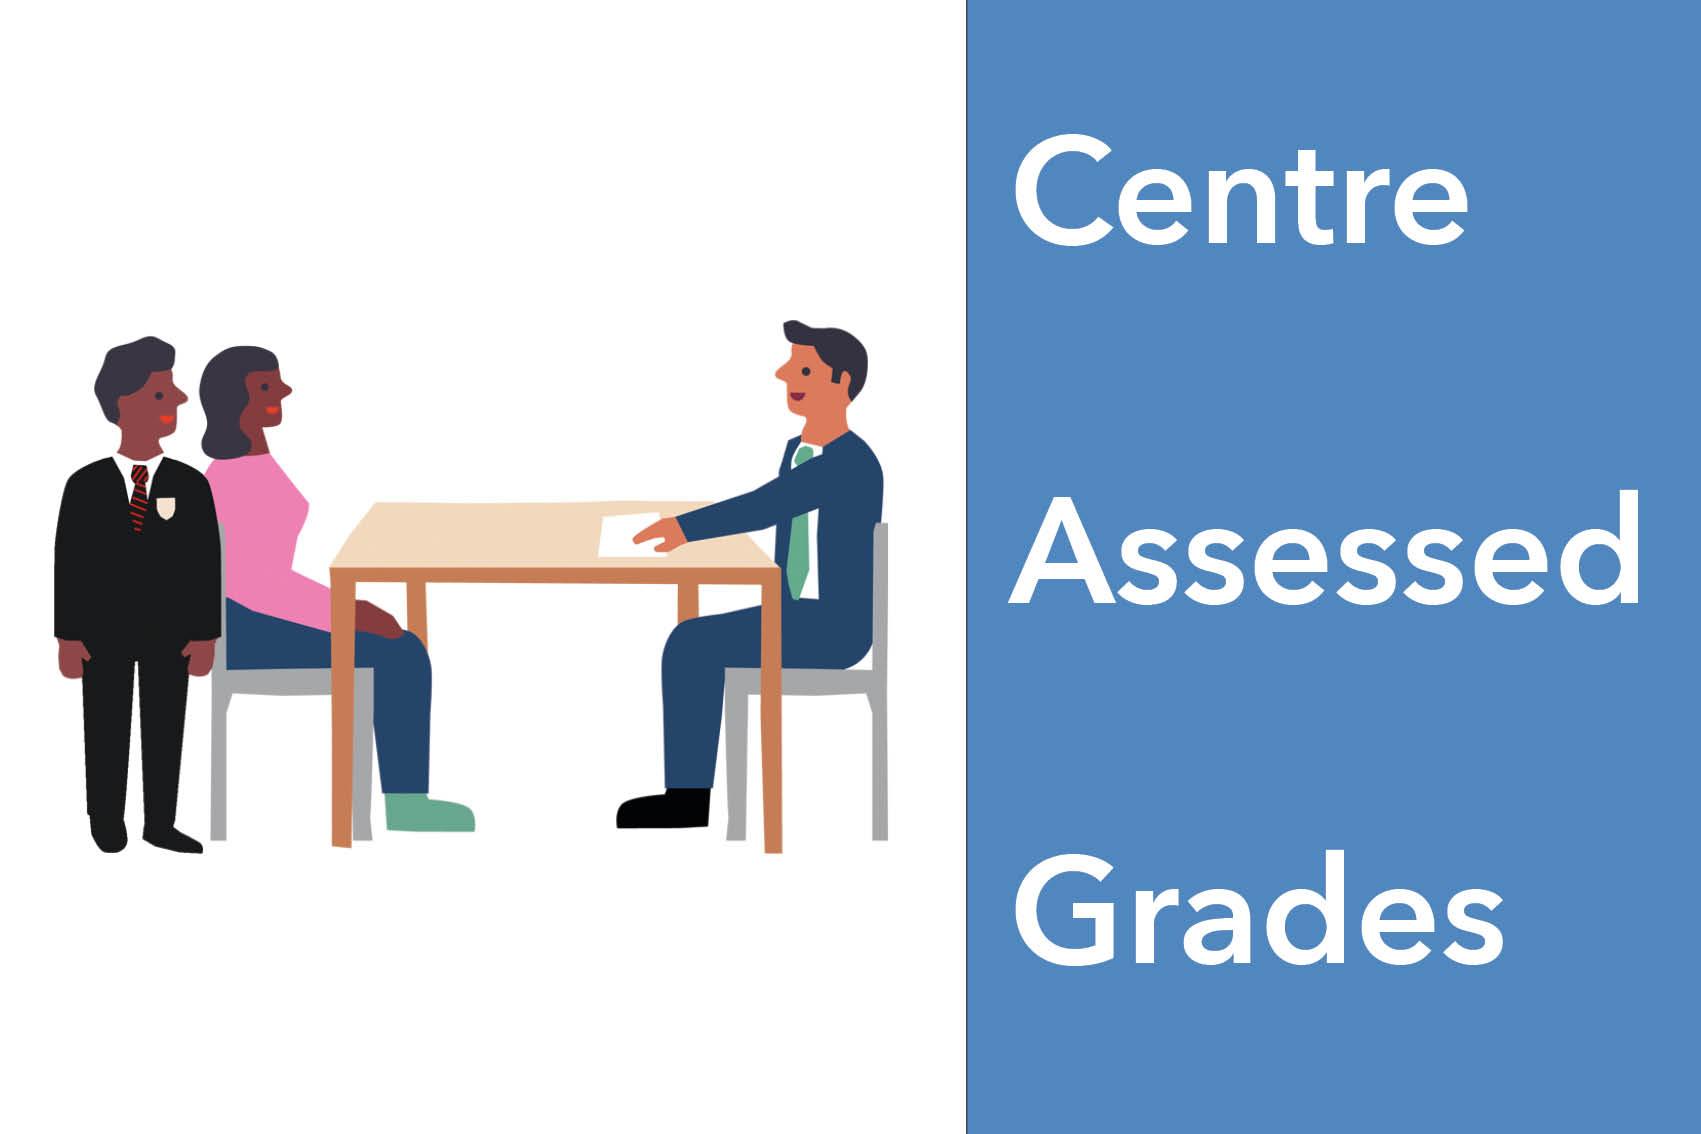 Centre Assessed Grades